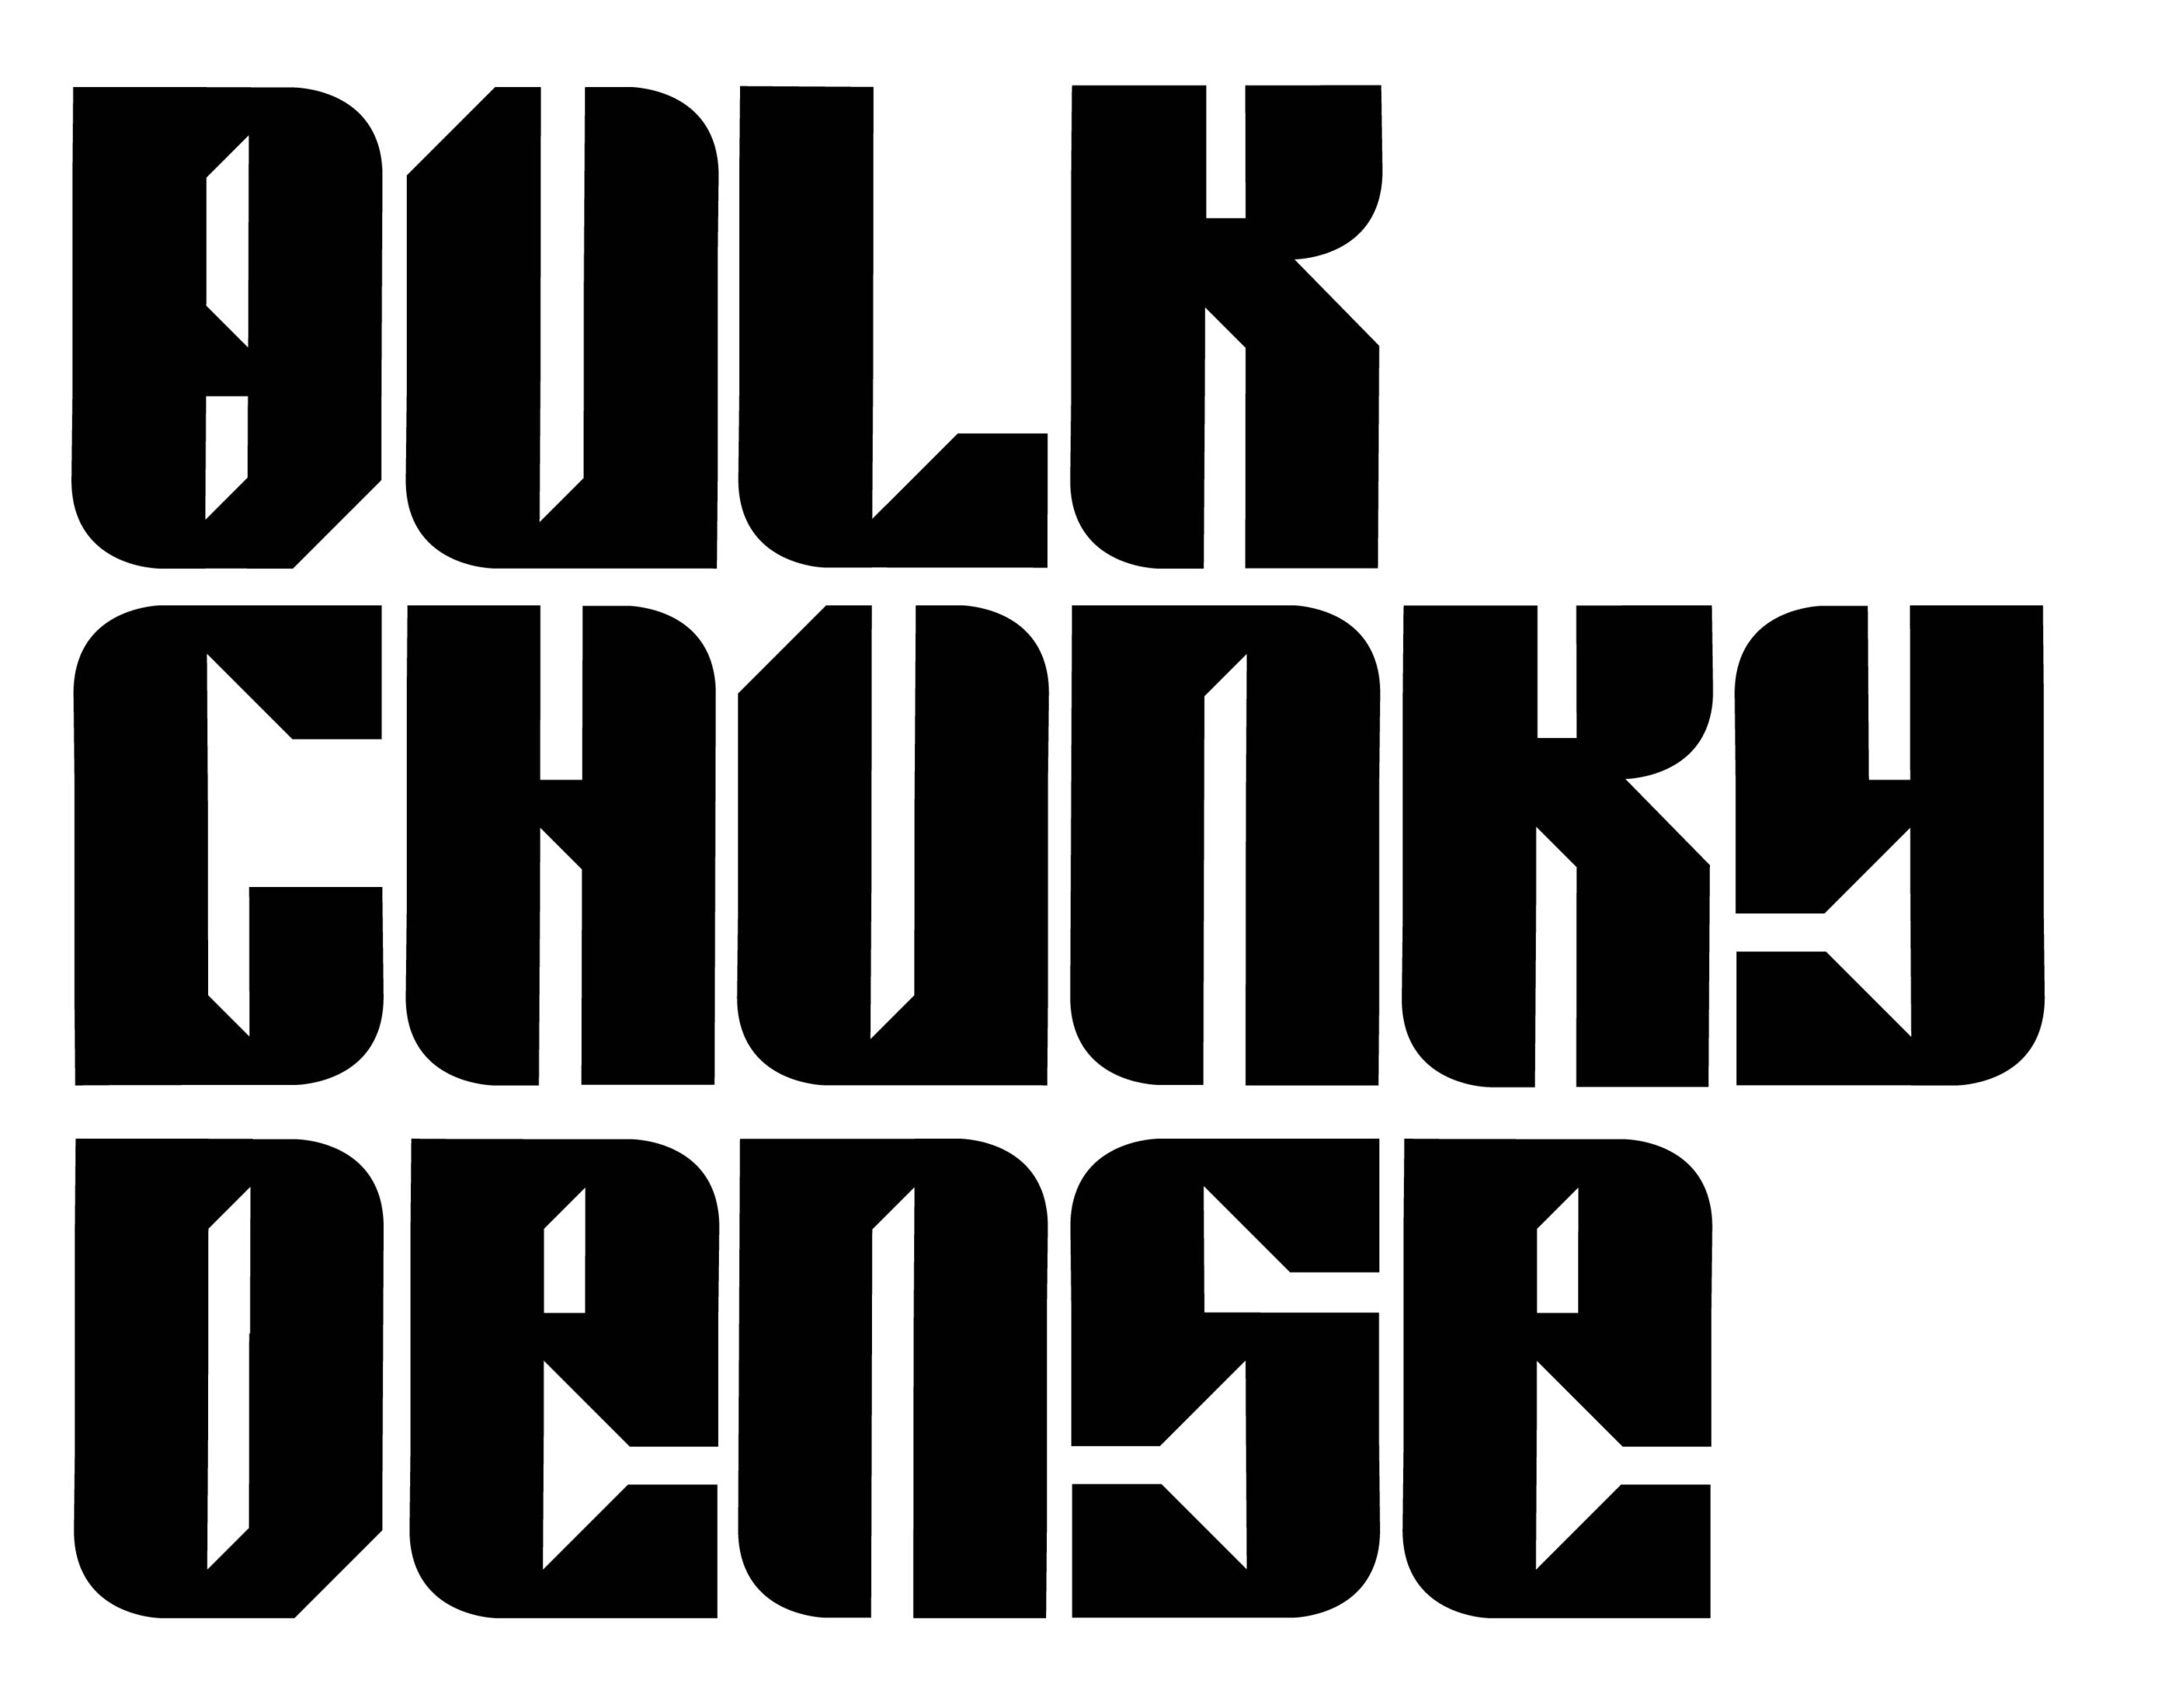 Chisel-Typeface-02-1